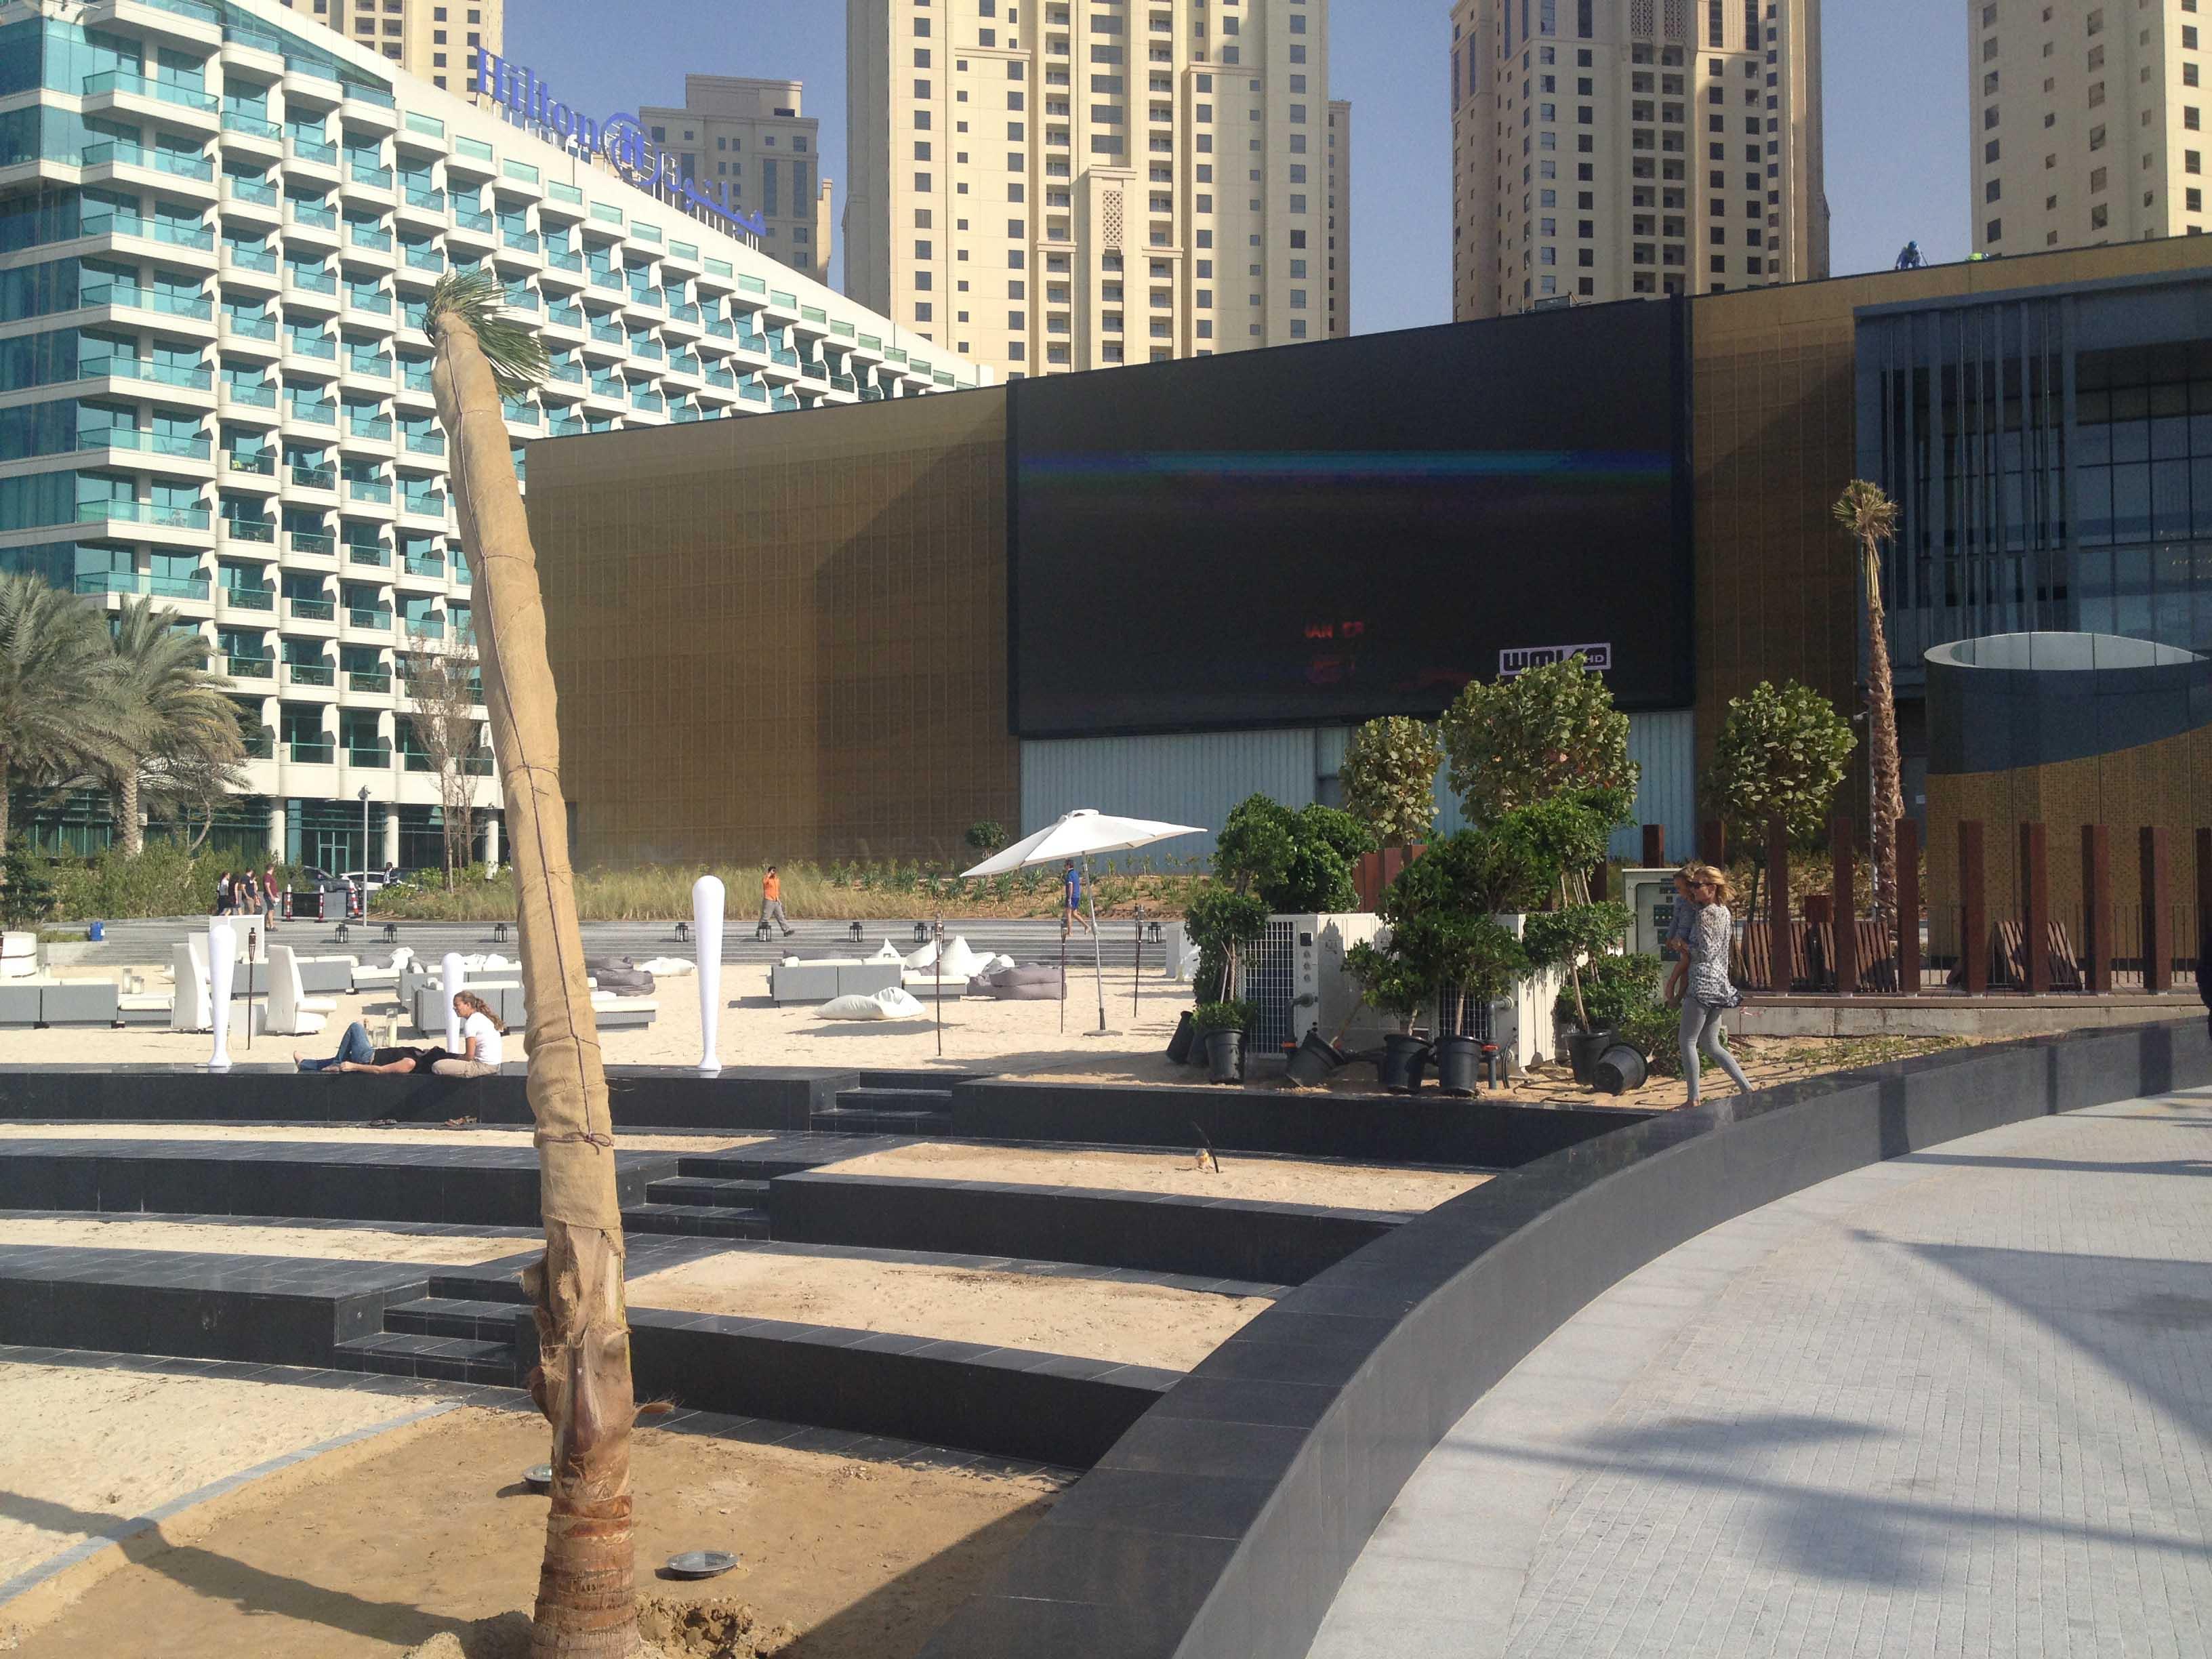 Jumeirah Beach Residence or GPR